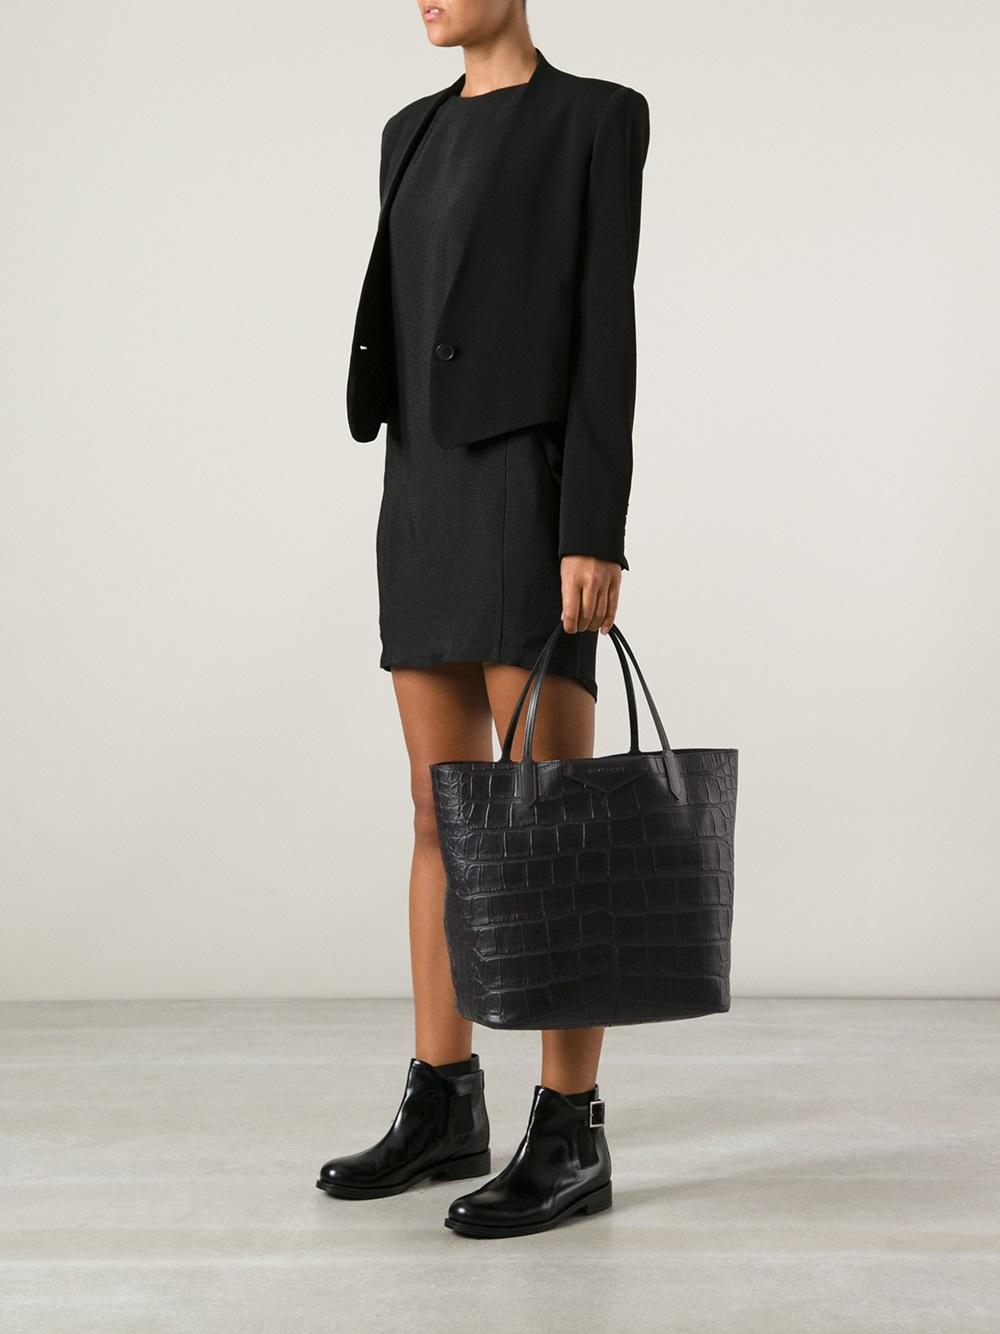 1faf79717d36 Lyst - Givenchy Antigona Large Shopping Tote in Black